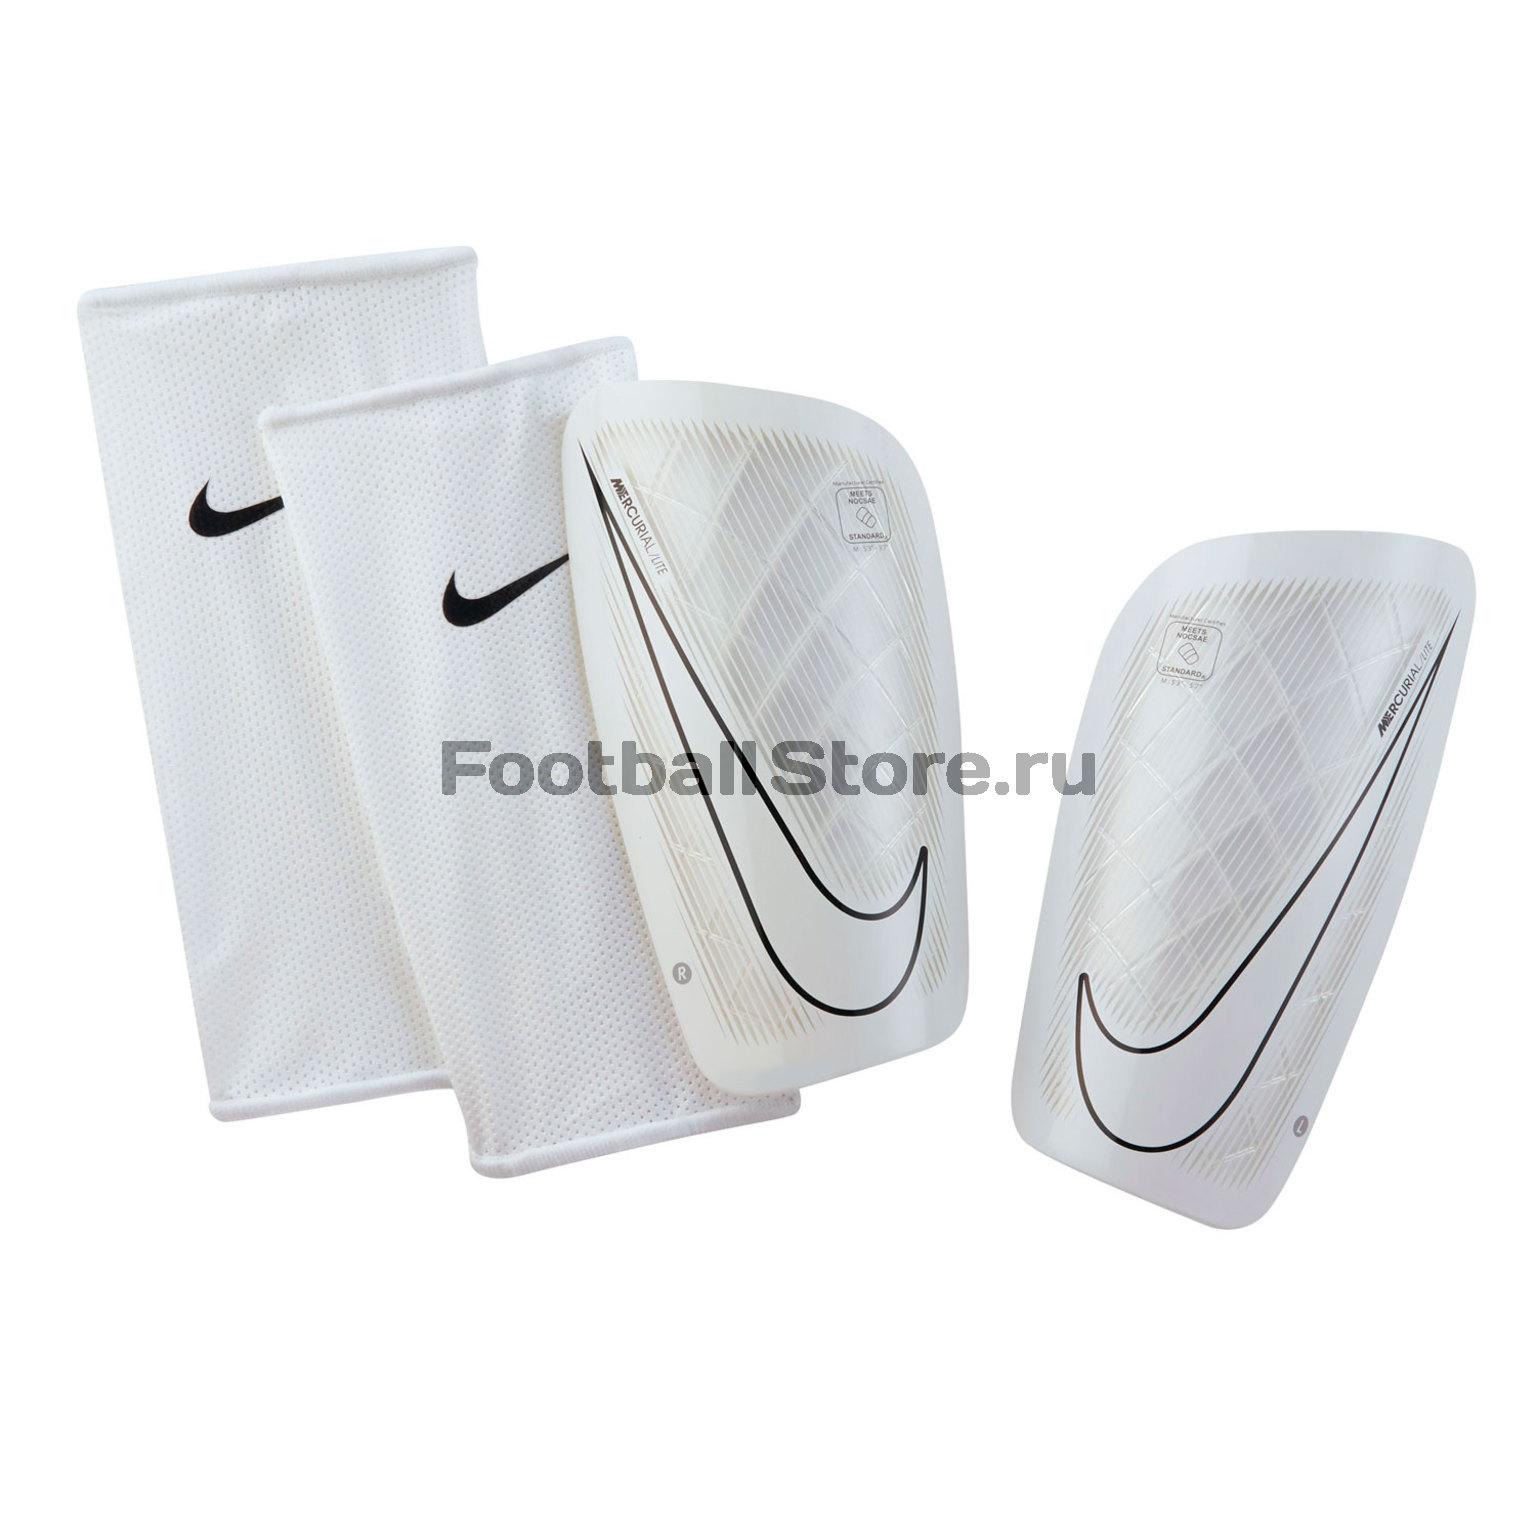 Щитки Nike NK Merc LT GRD SP2086-100 щитки nike щитки nk merc lt grd